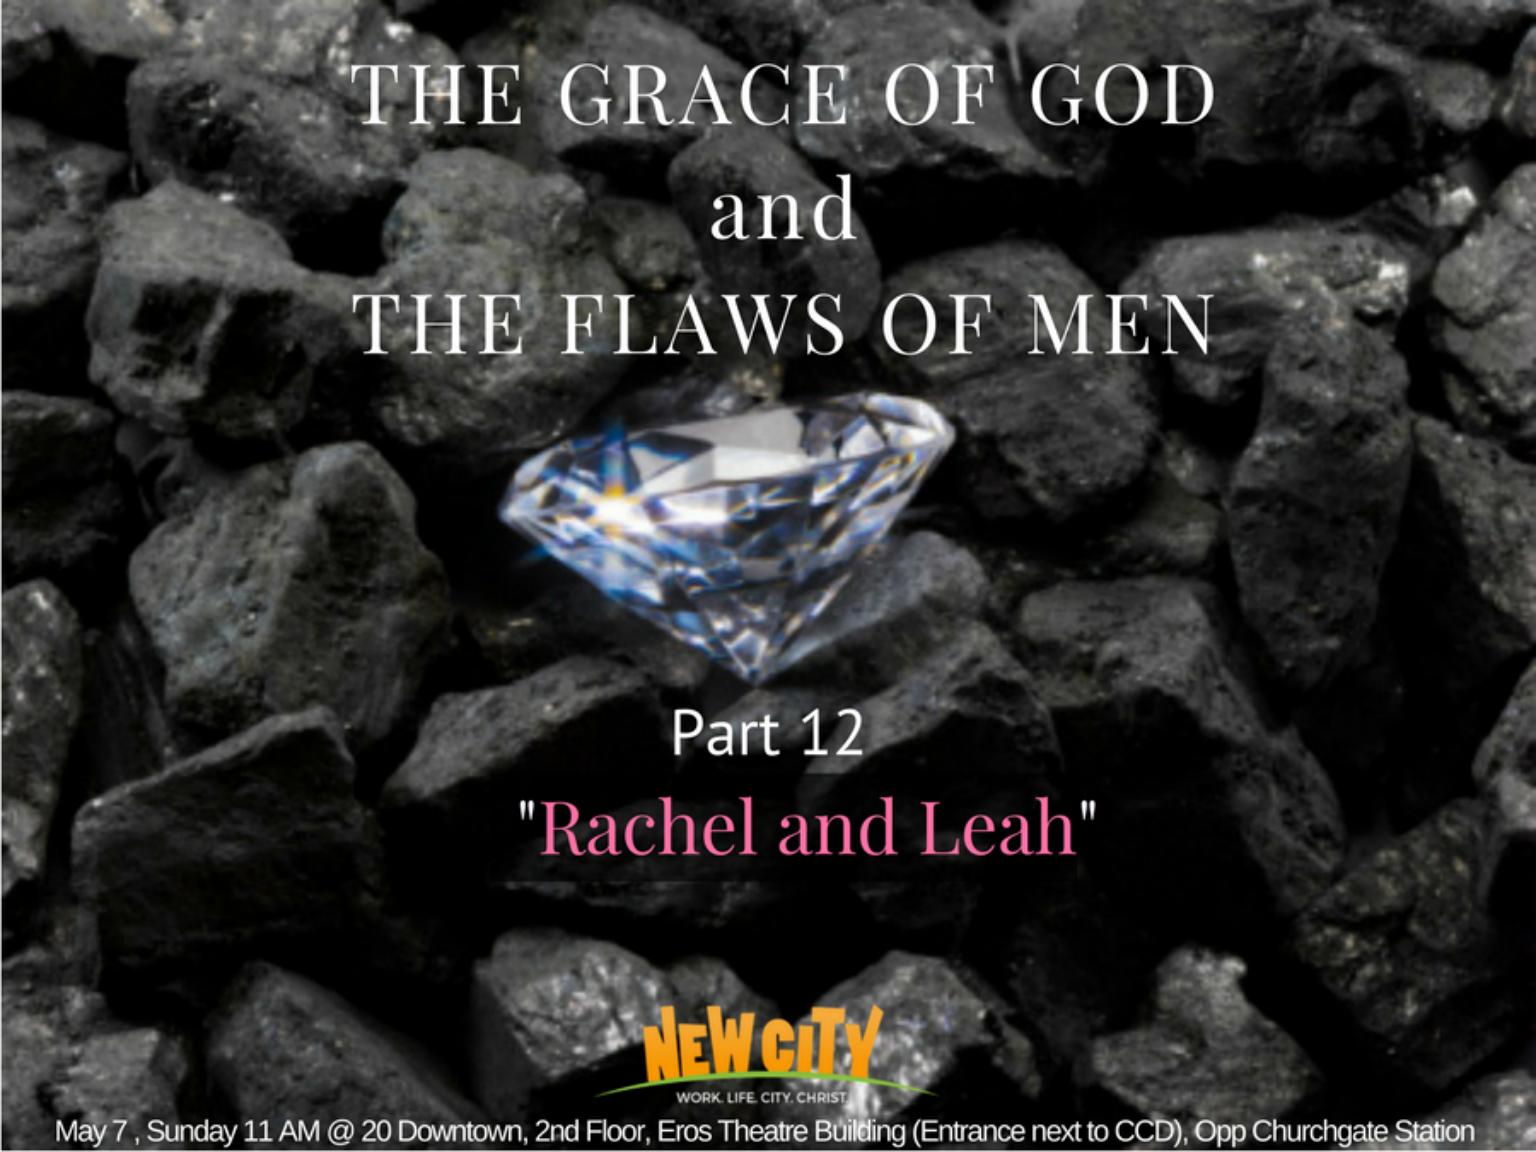 Rachel and Leah Image